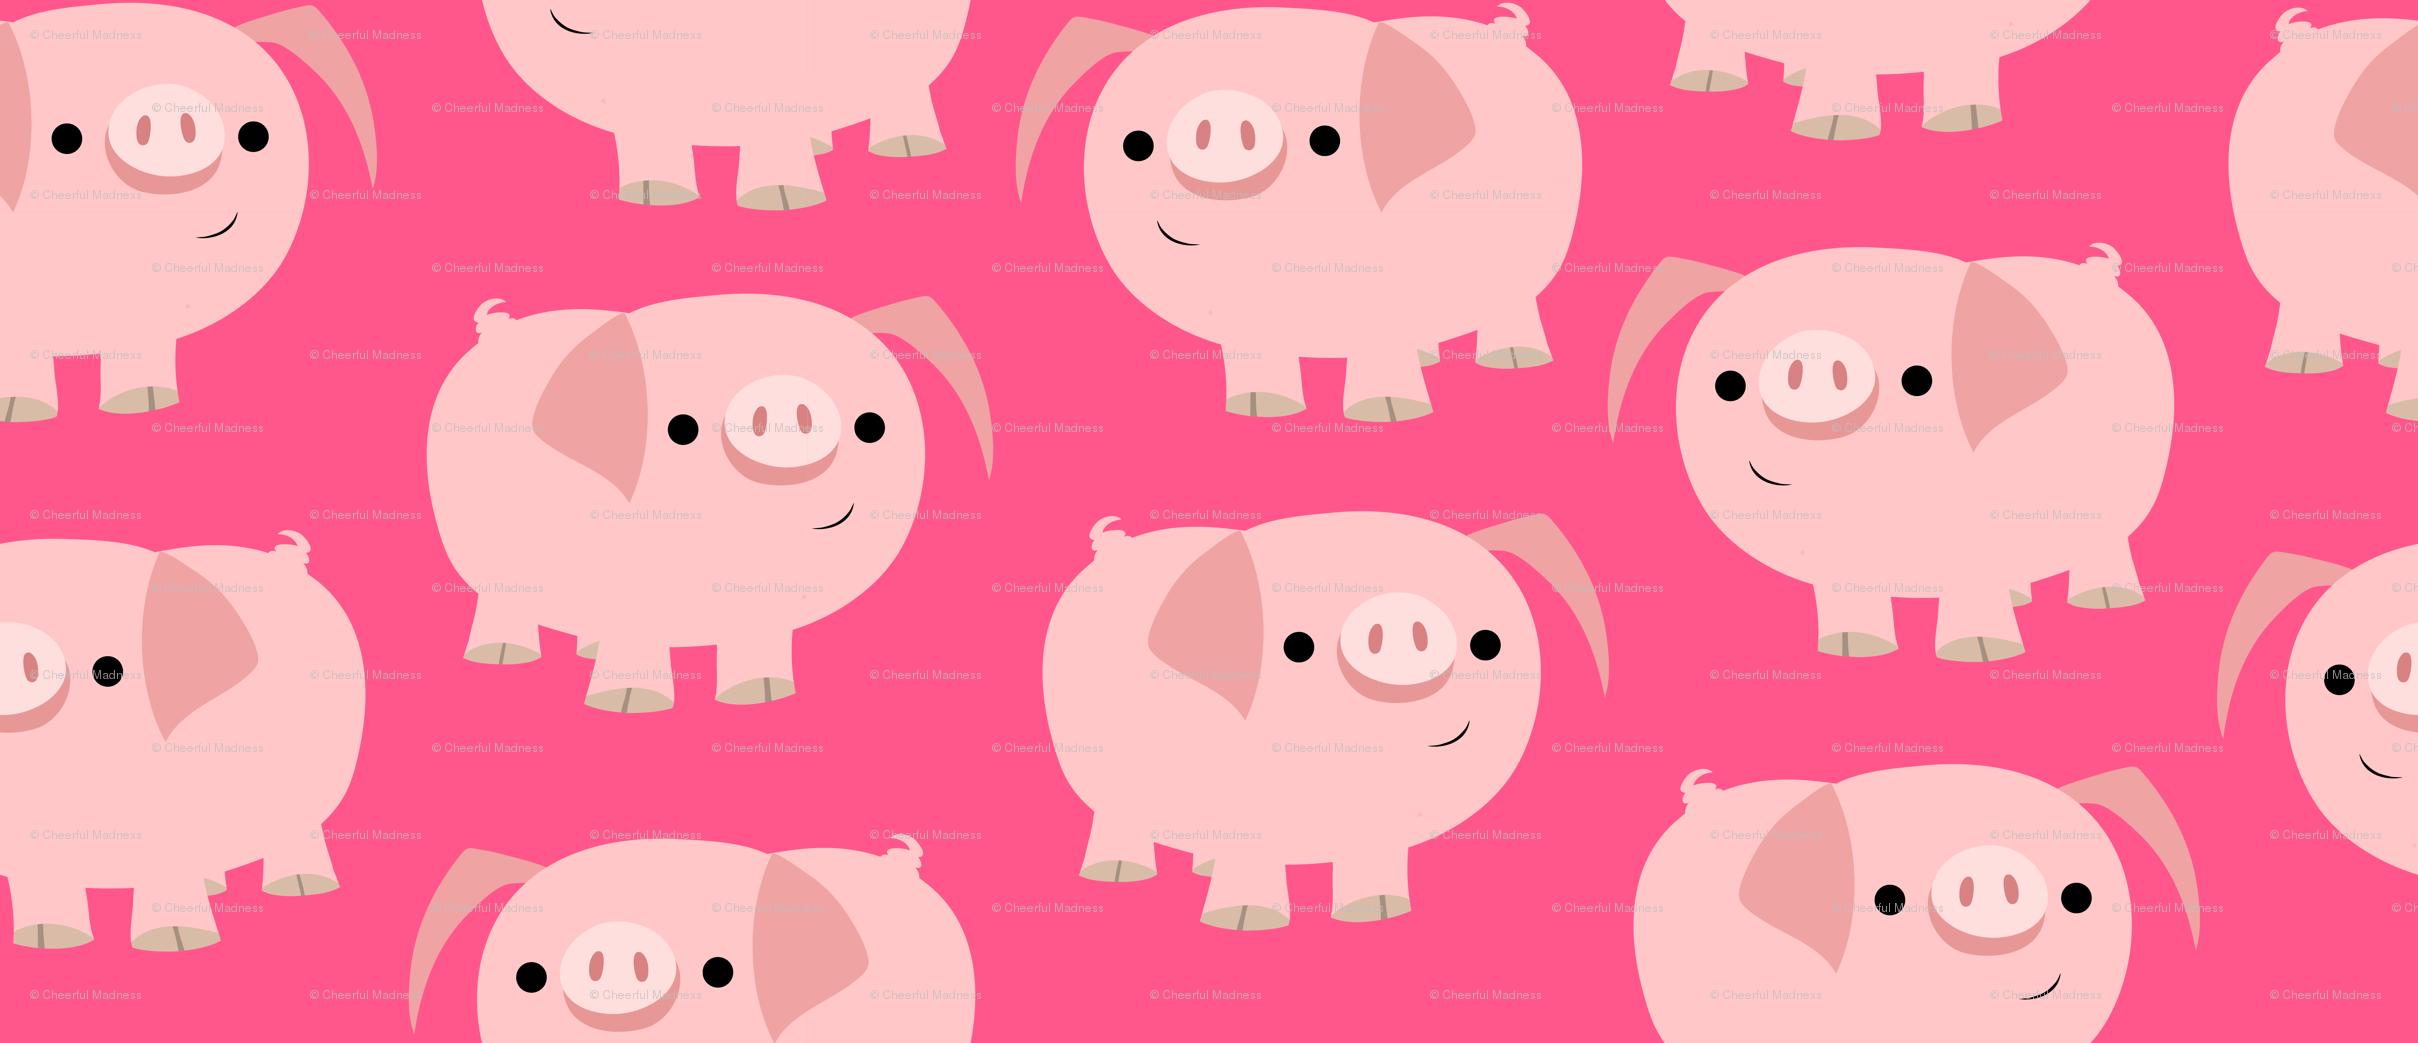 Wallpapers pig cartoon wallpaper cave - Pig wallpaper cartoon pig ...